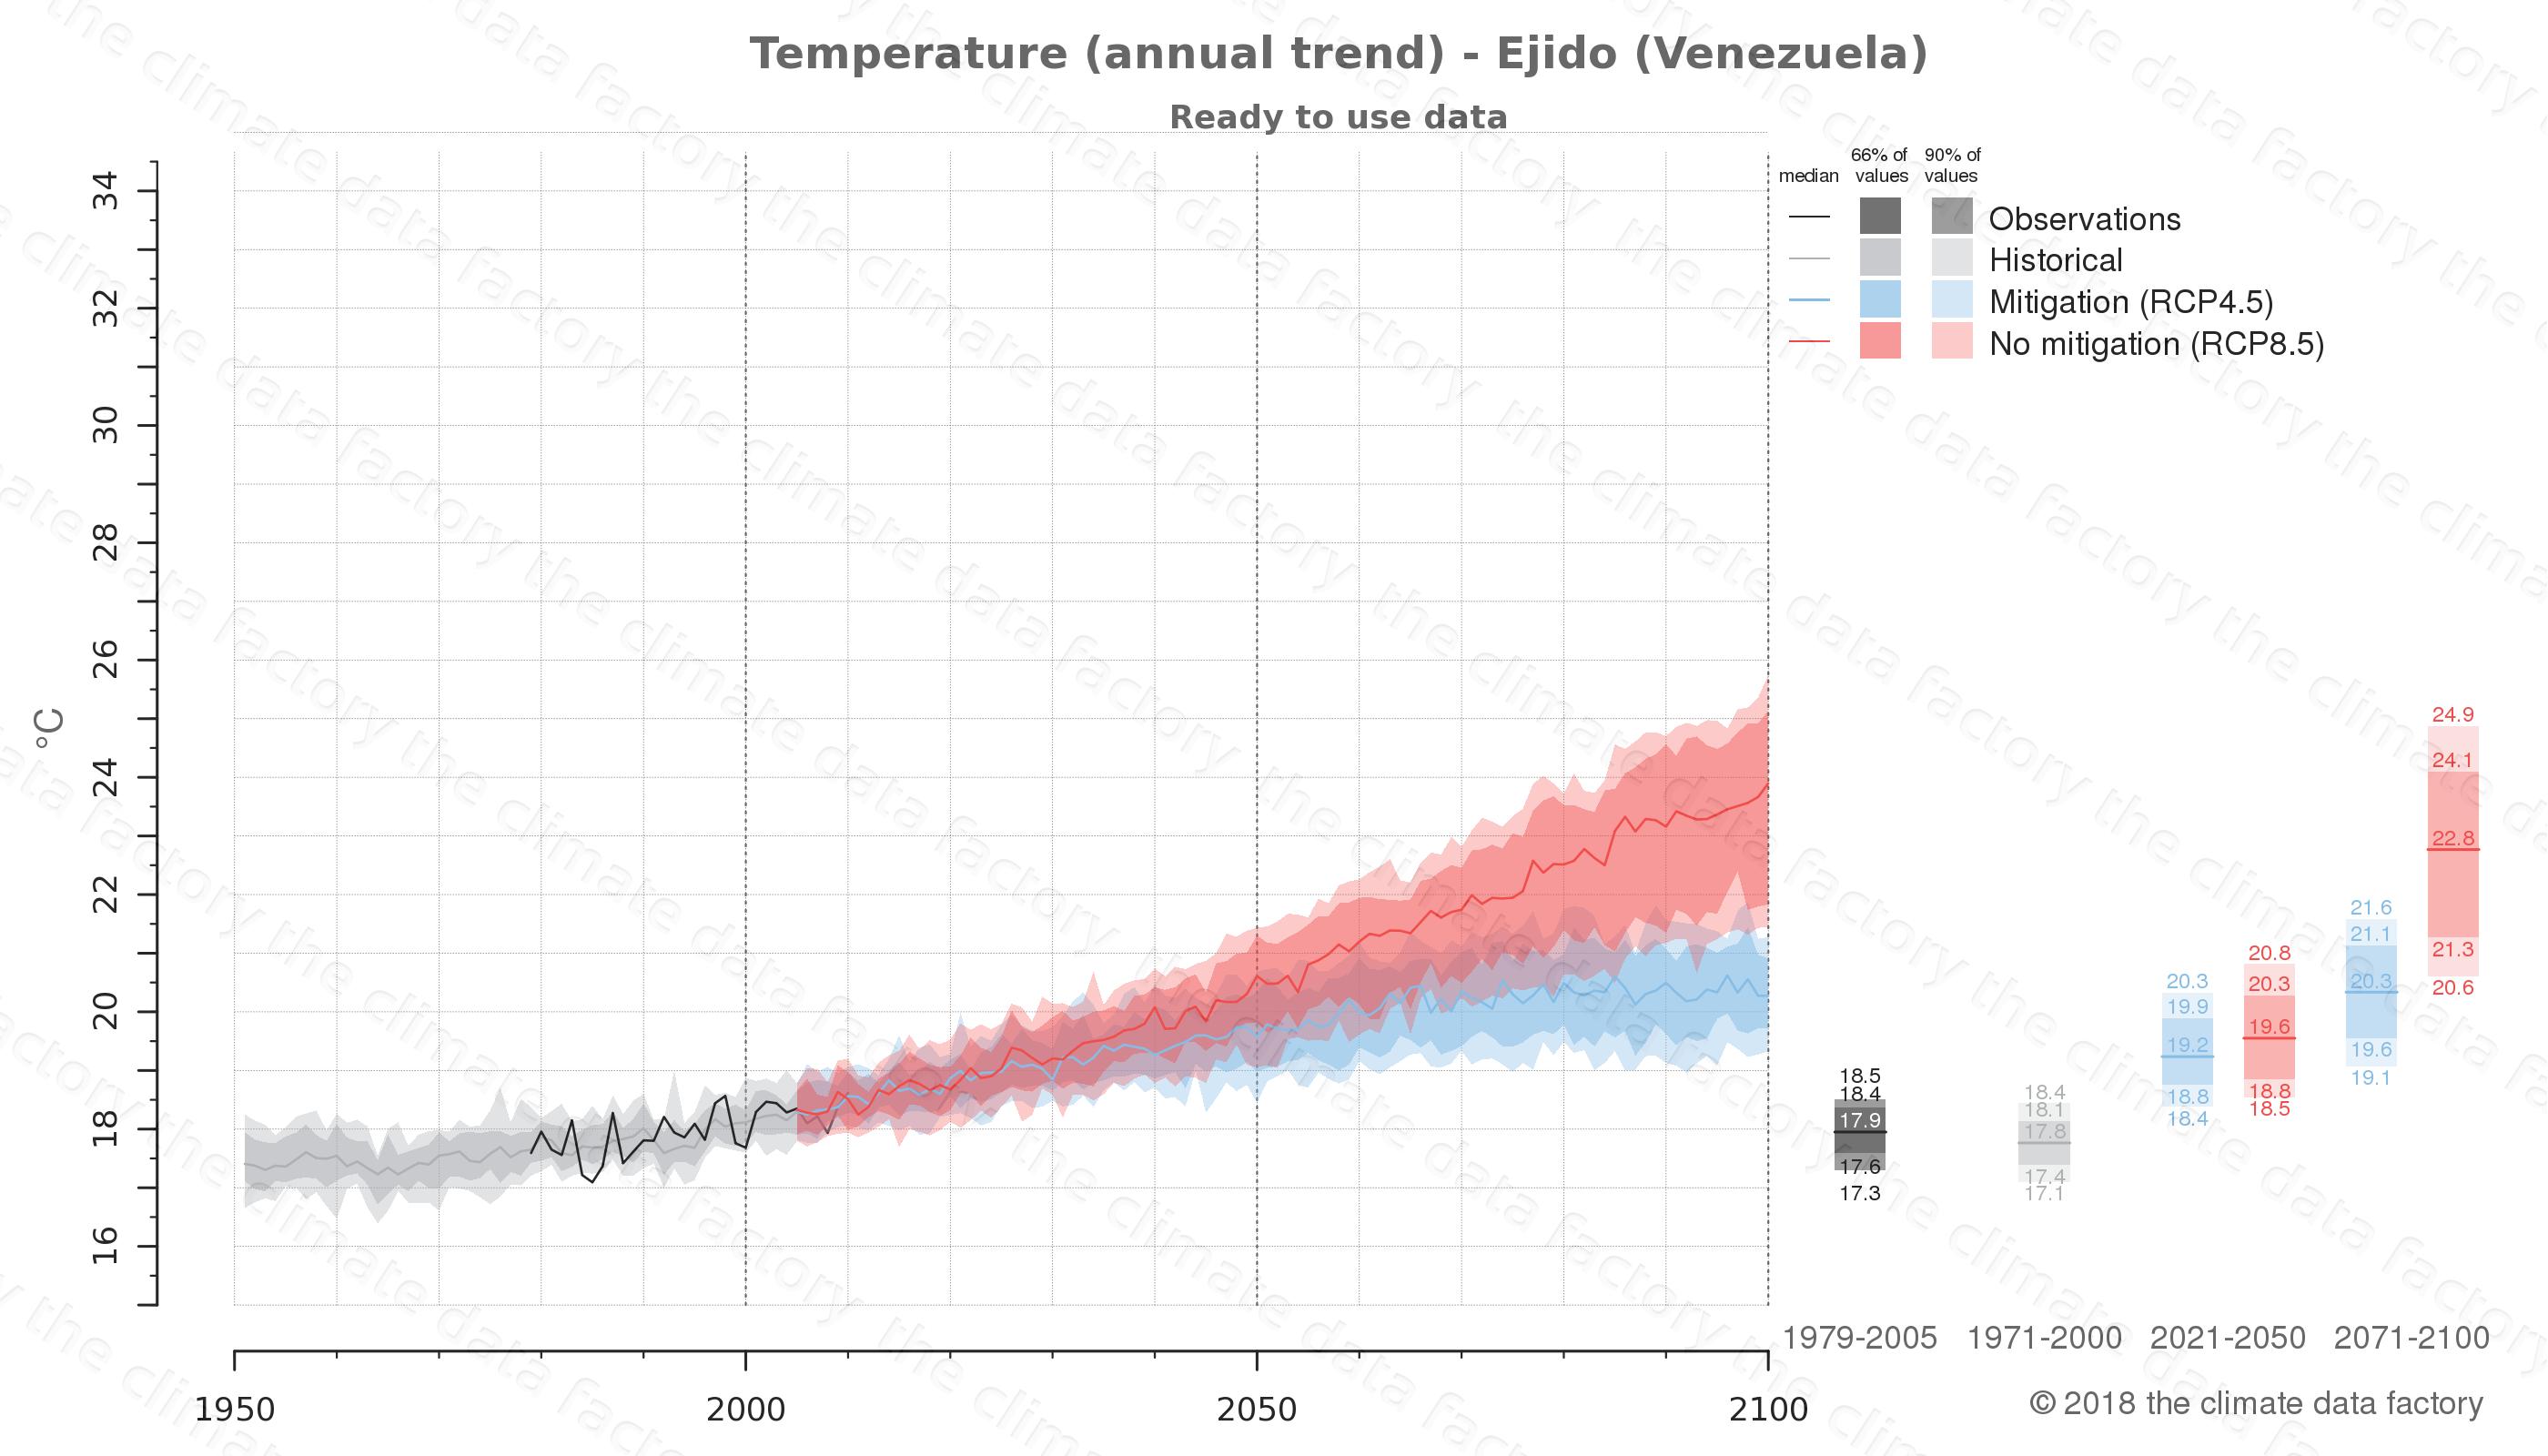 climate change data policy adaptation climate graph city data temperature ejido venezuela